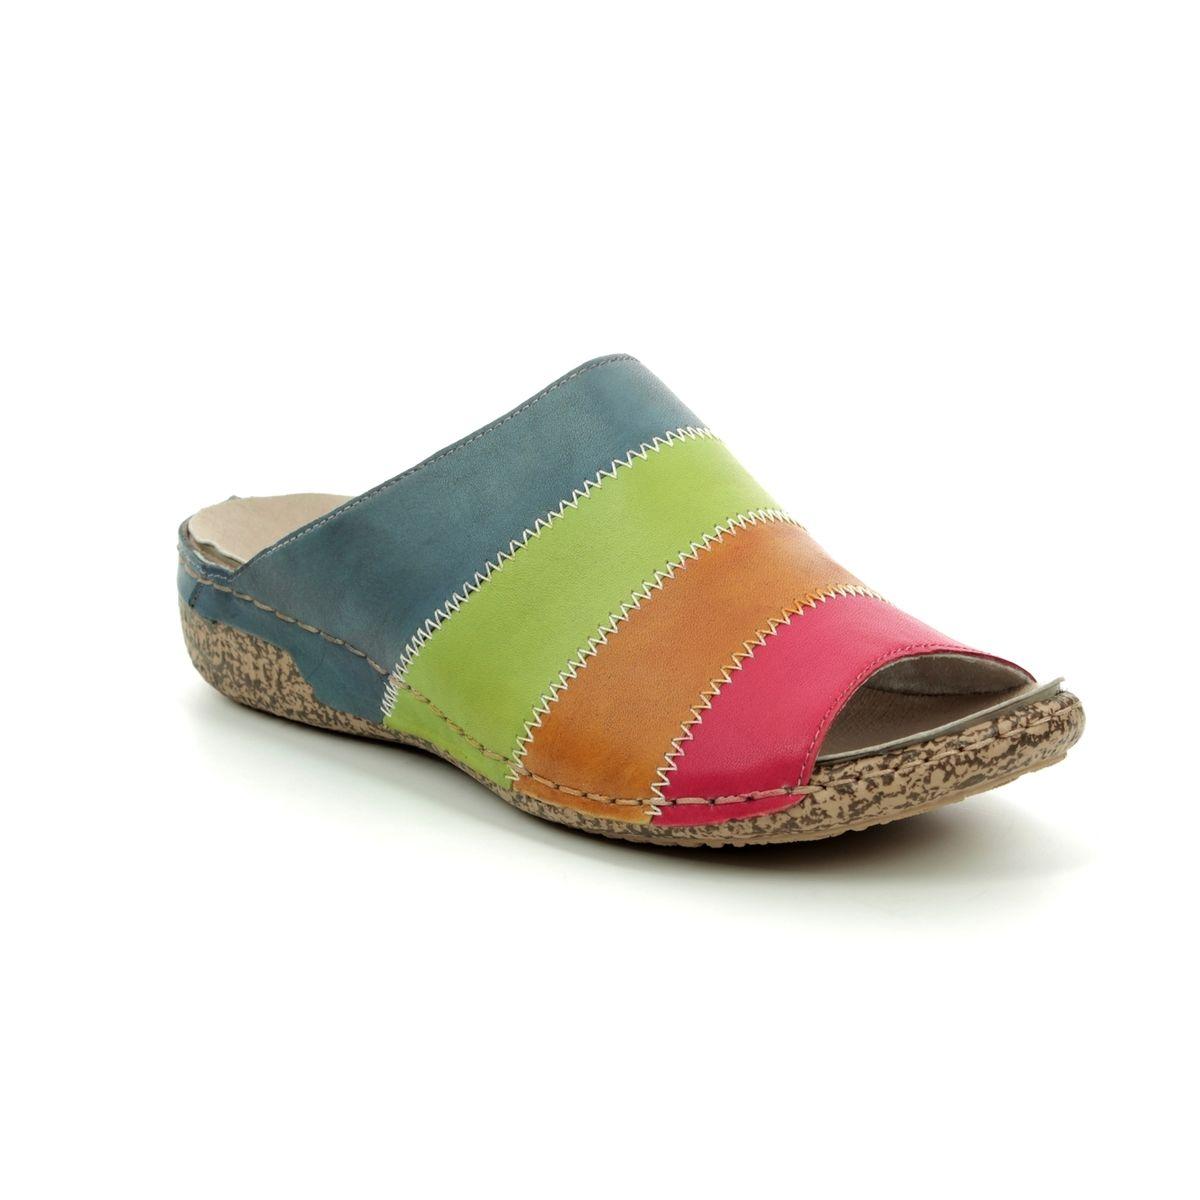 Shoes & Bags Rieker Womens V7266-15 Mules Women's Shoes